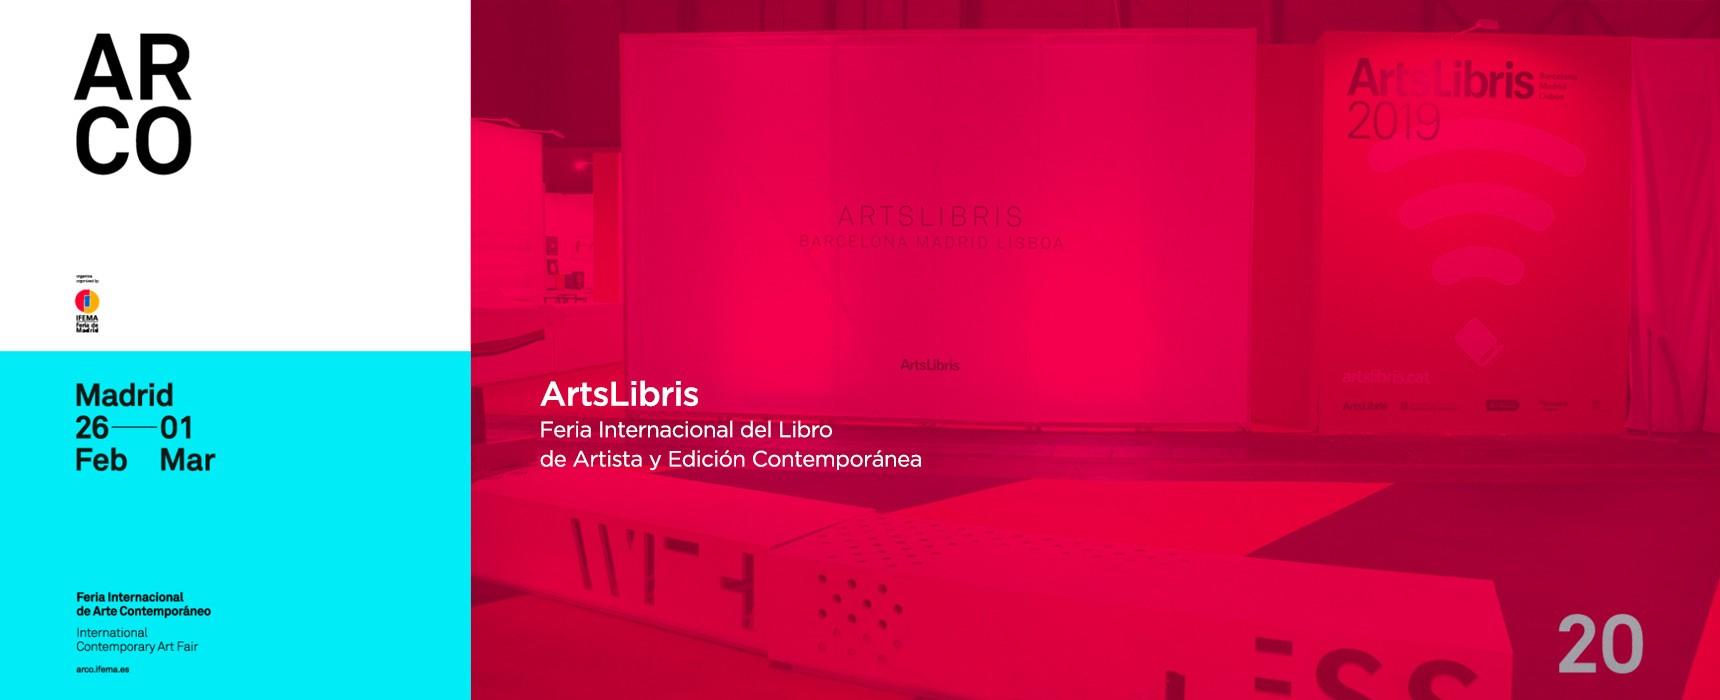 ArtsLibris 2020 ARCO Madrid